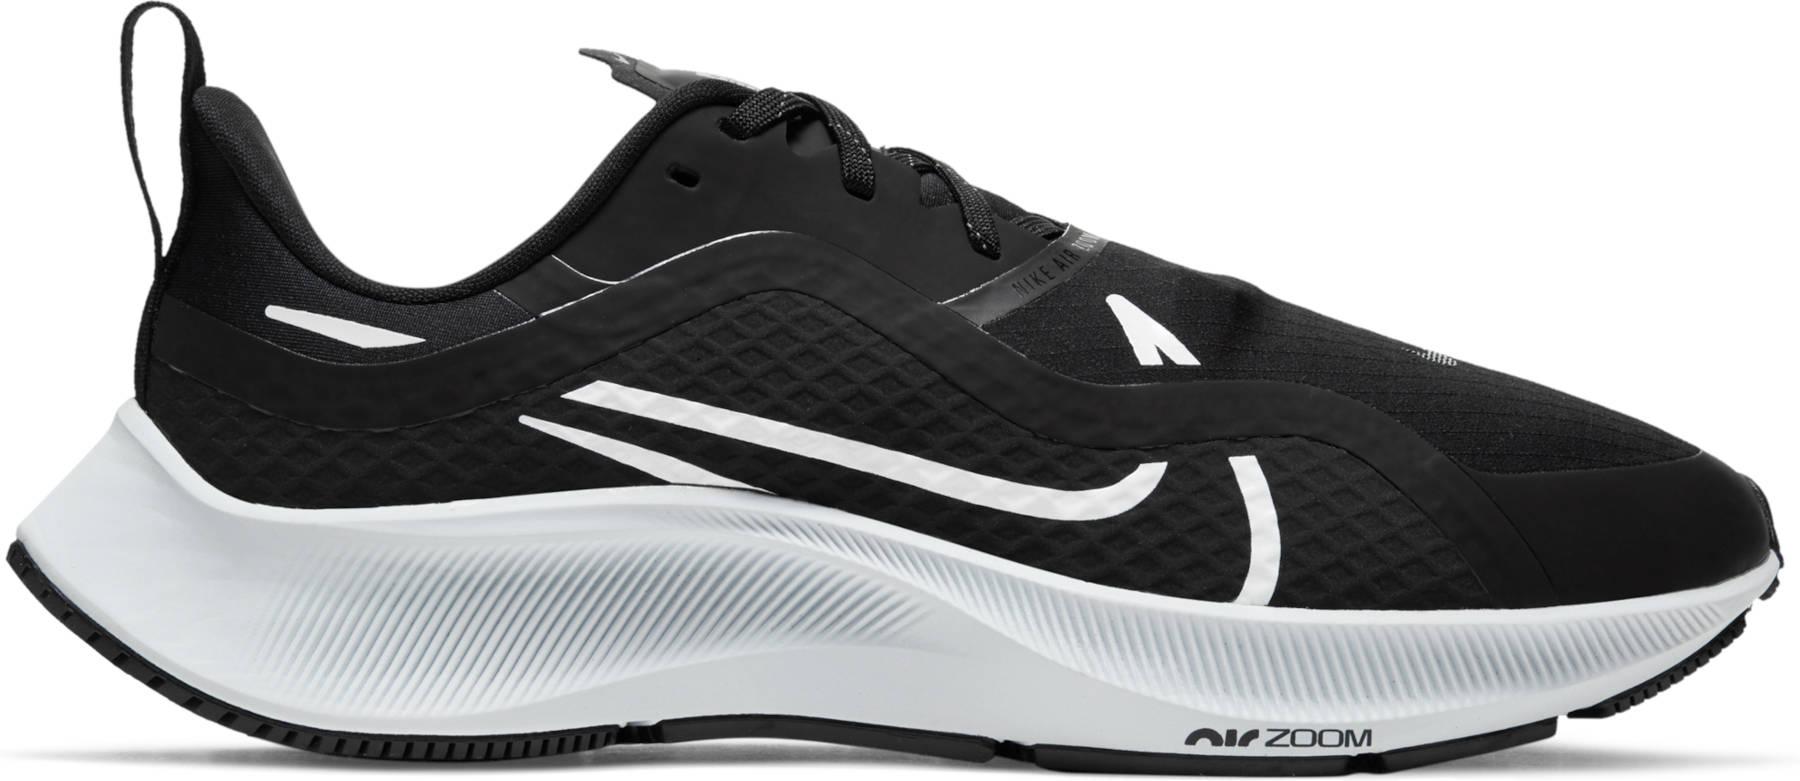 Produktbild von Nike Air Zoom Pegasus 37 Shield Damen-Laufschuh - black/white-pure platinum-reflective silver CQ8639-002